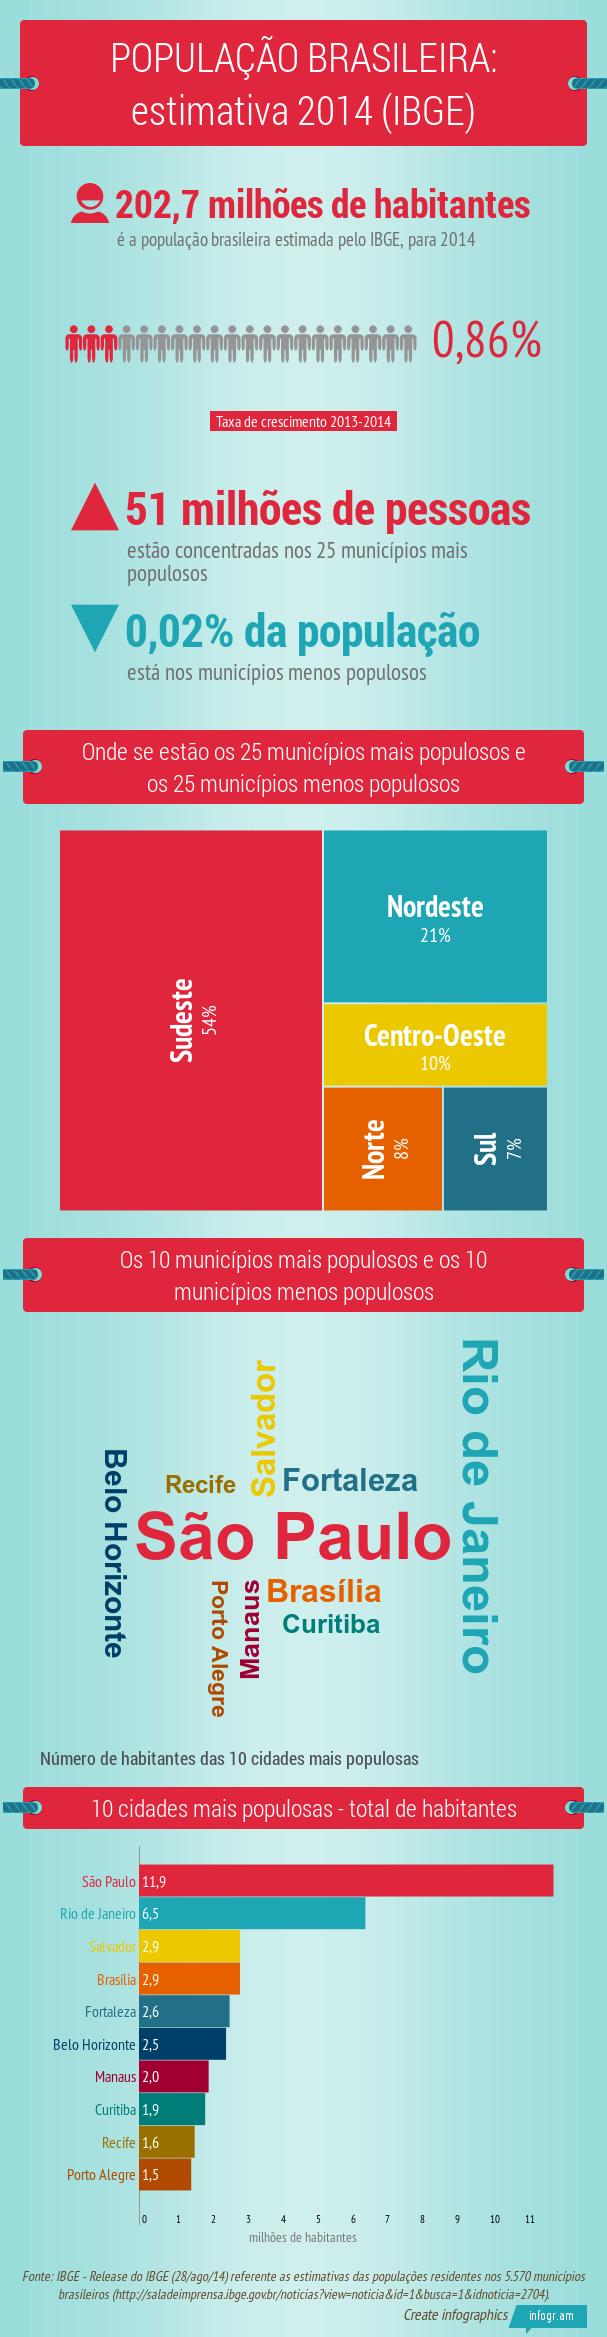 POPULACAO_BRASILEIRA_estimativa_2014_IBGE